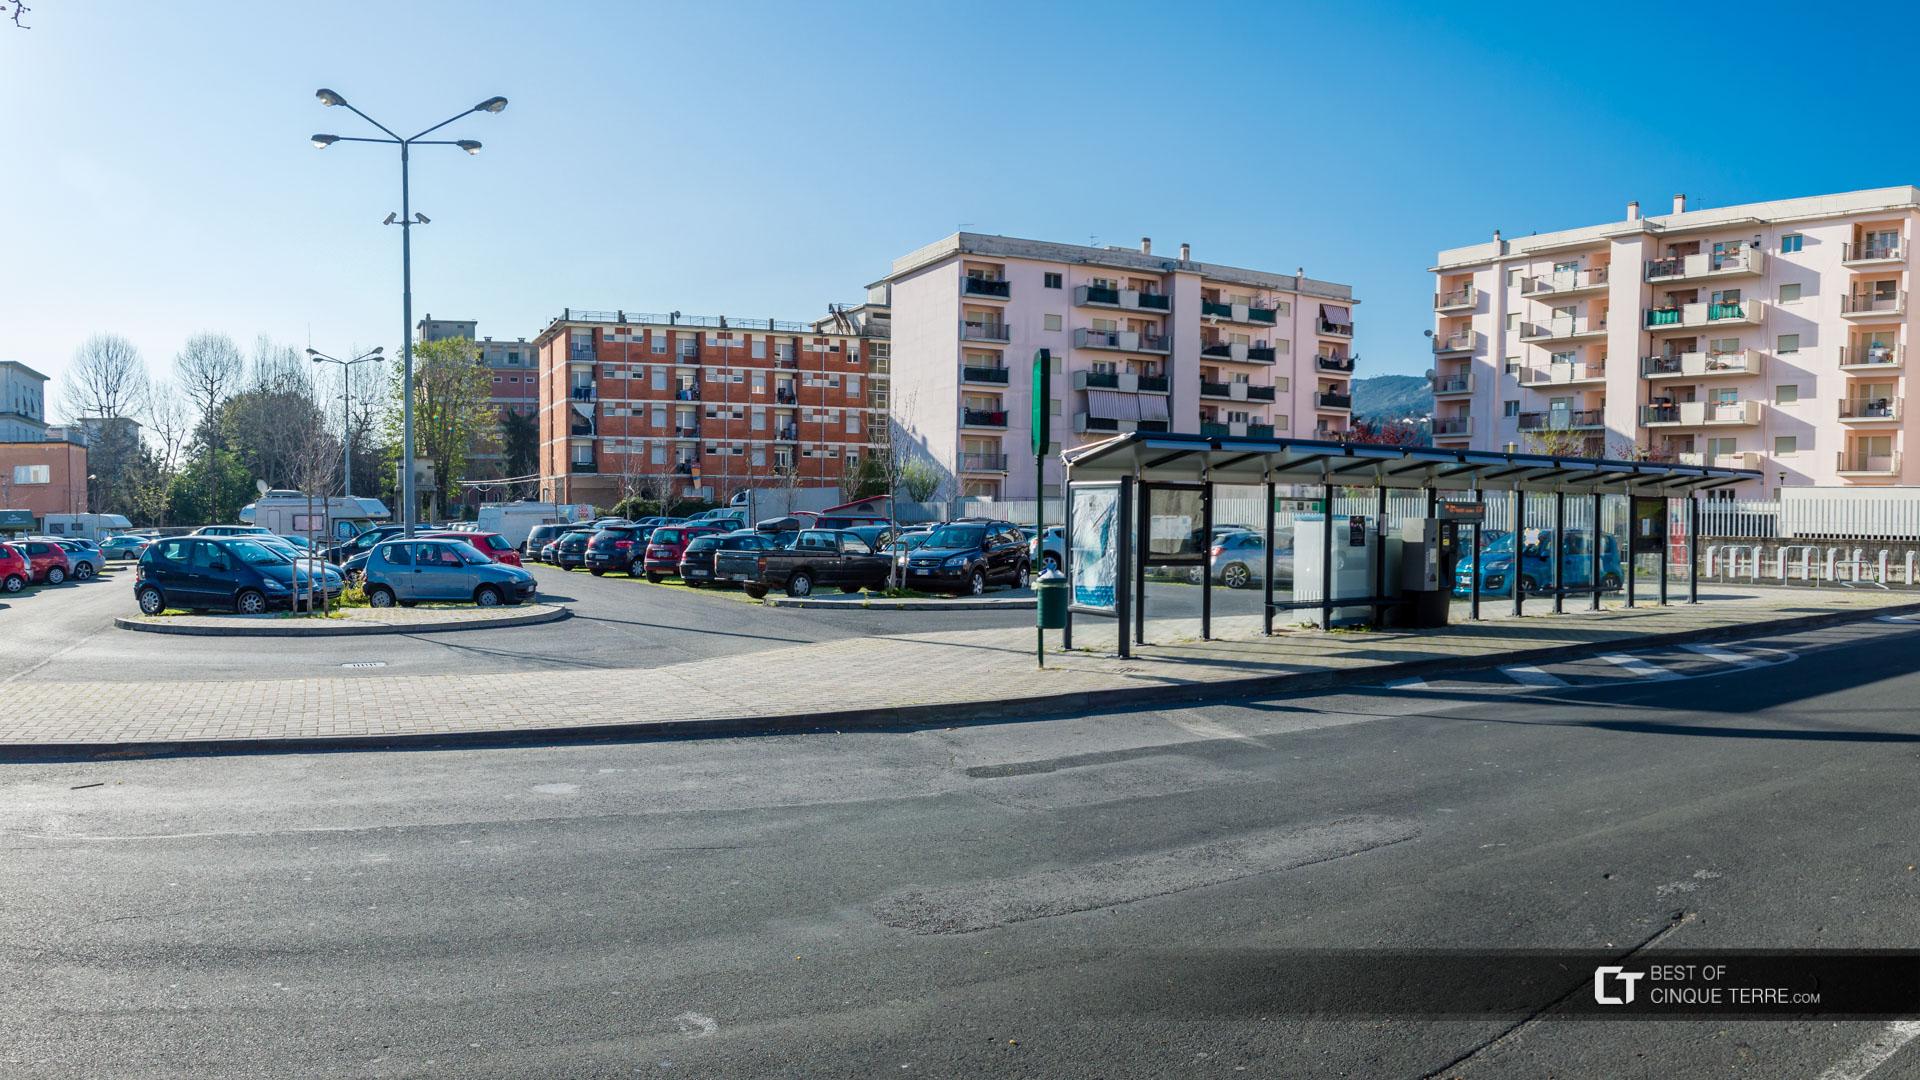 La Spezia Hotels Near Train Station